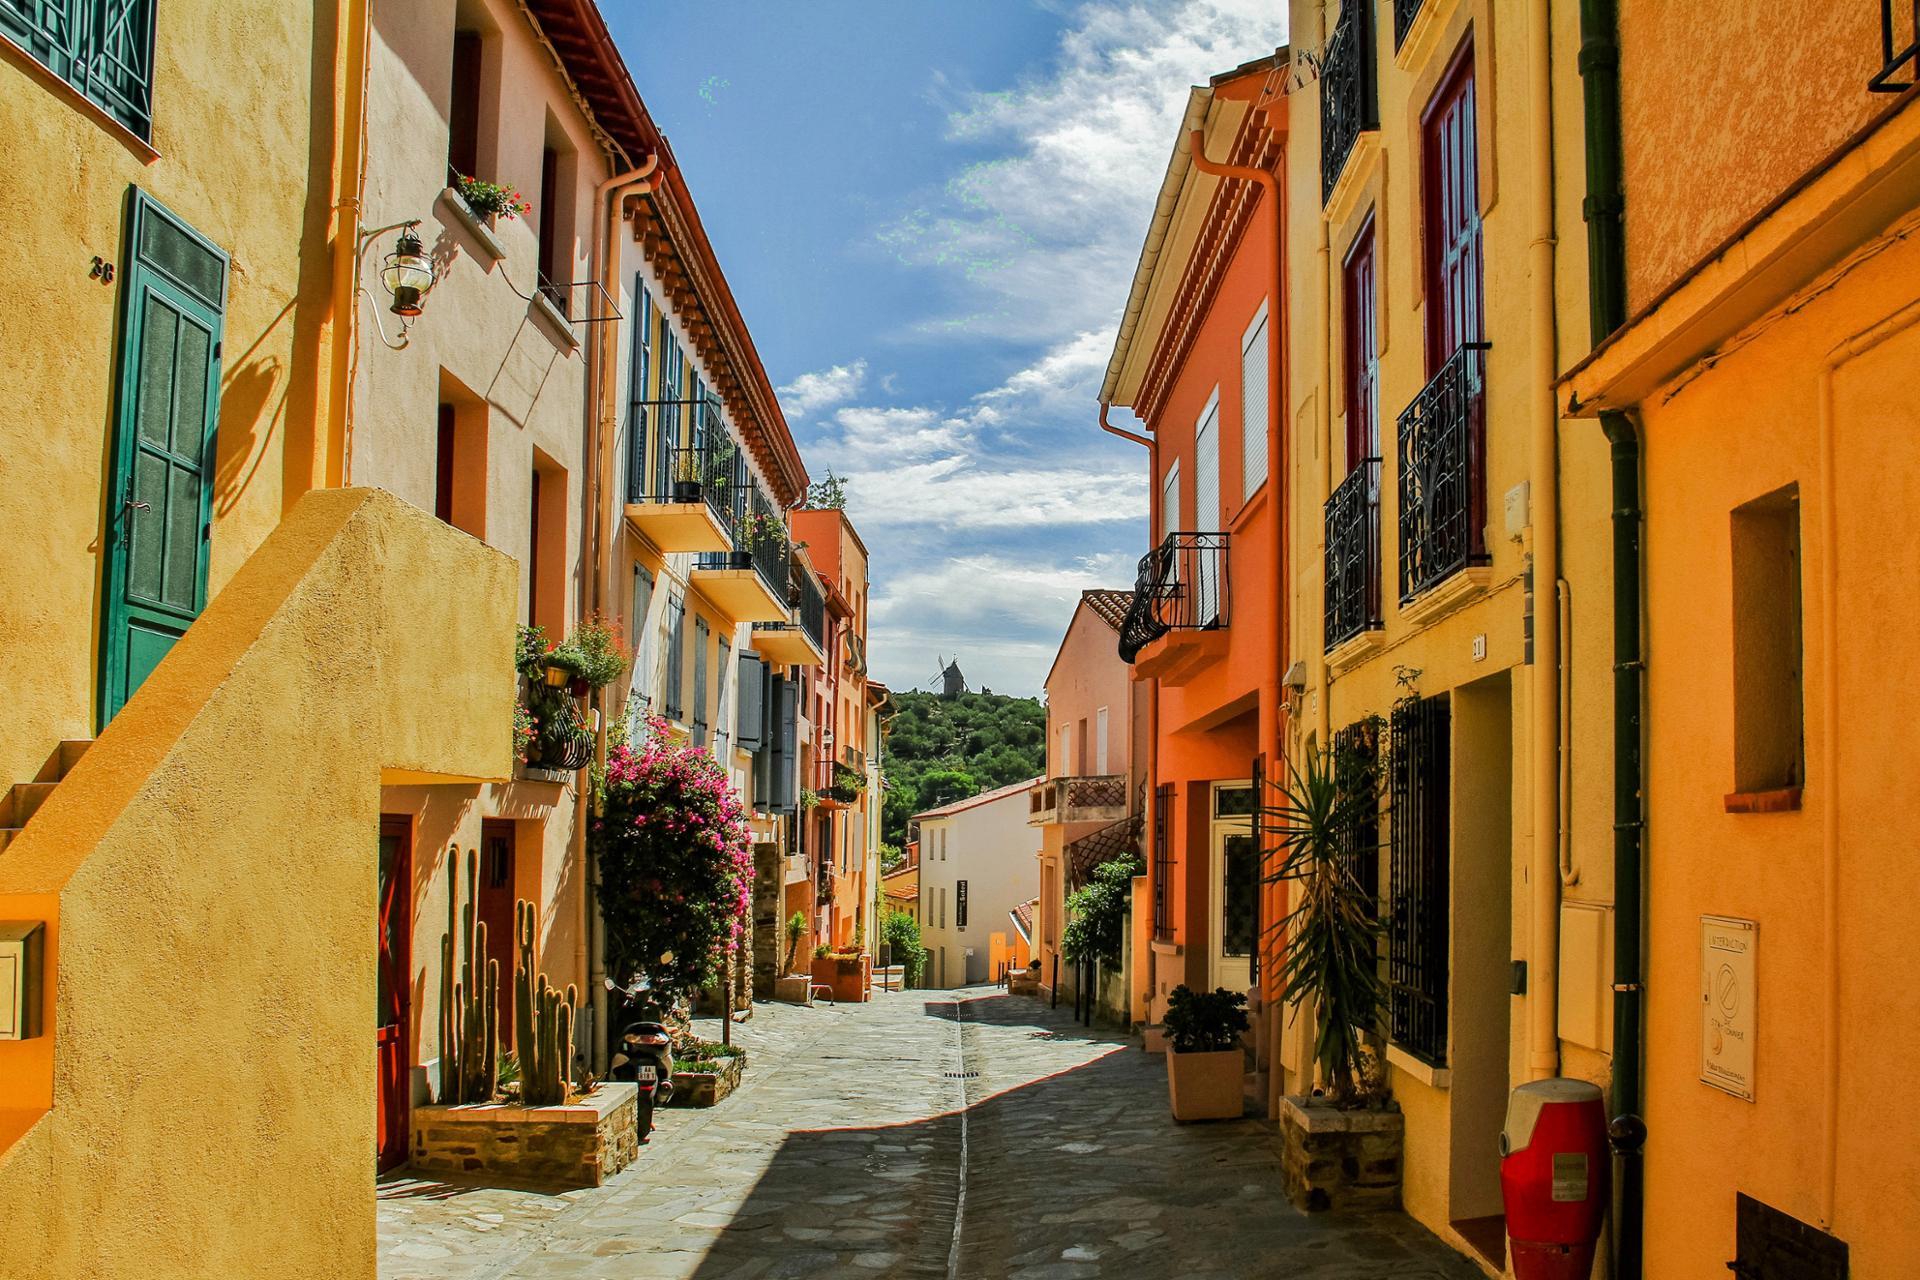 La rue ensoleillée (Collioure)